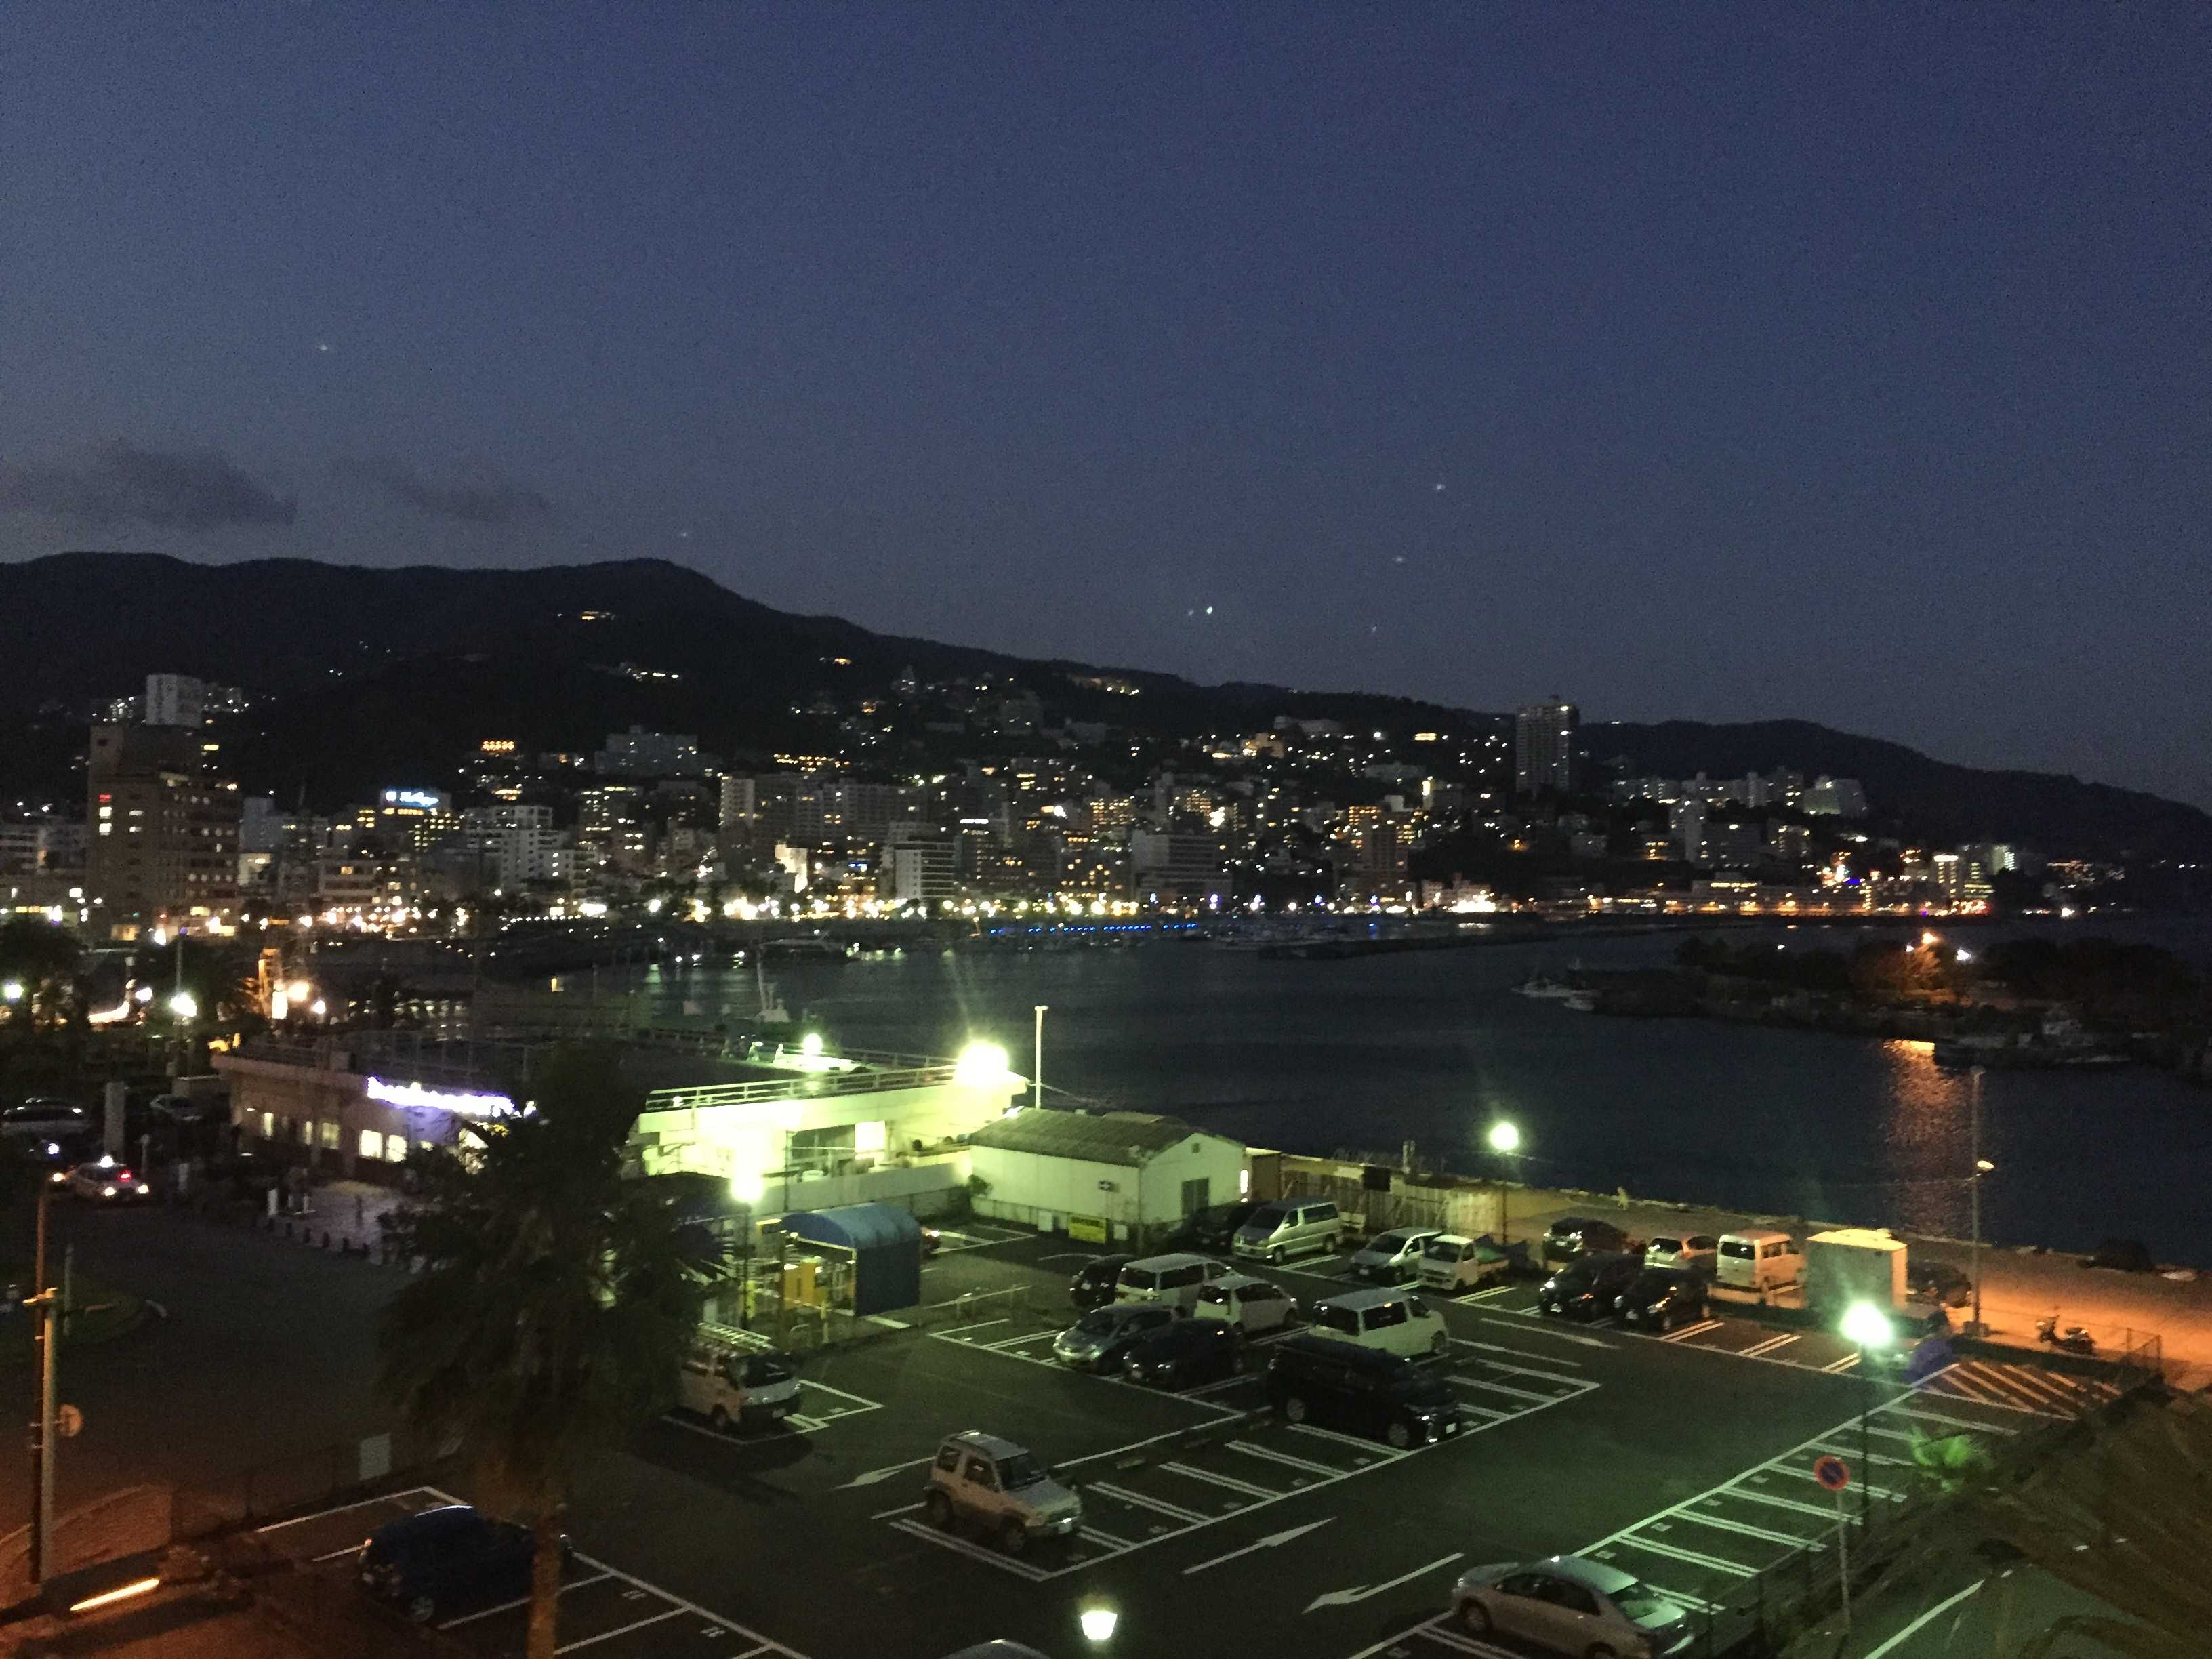 夜の熱海港